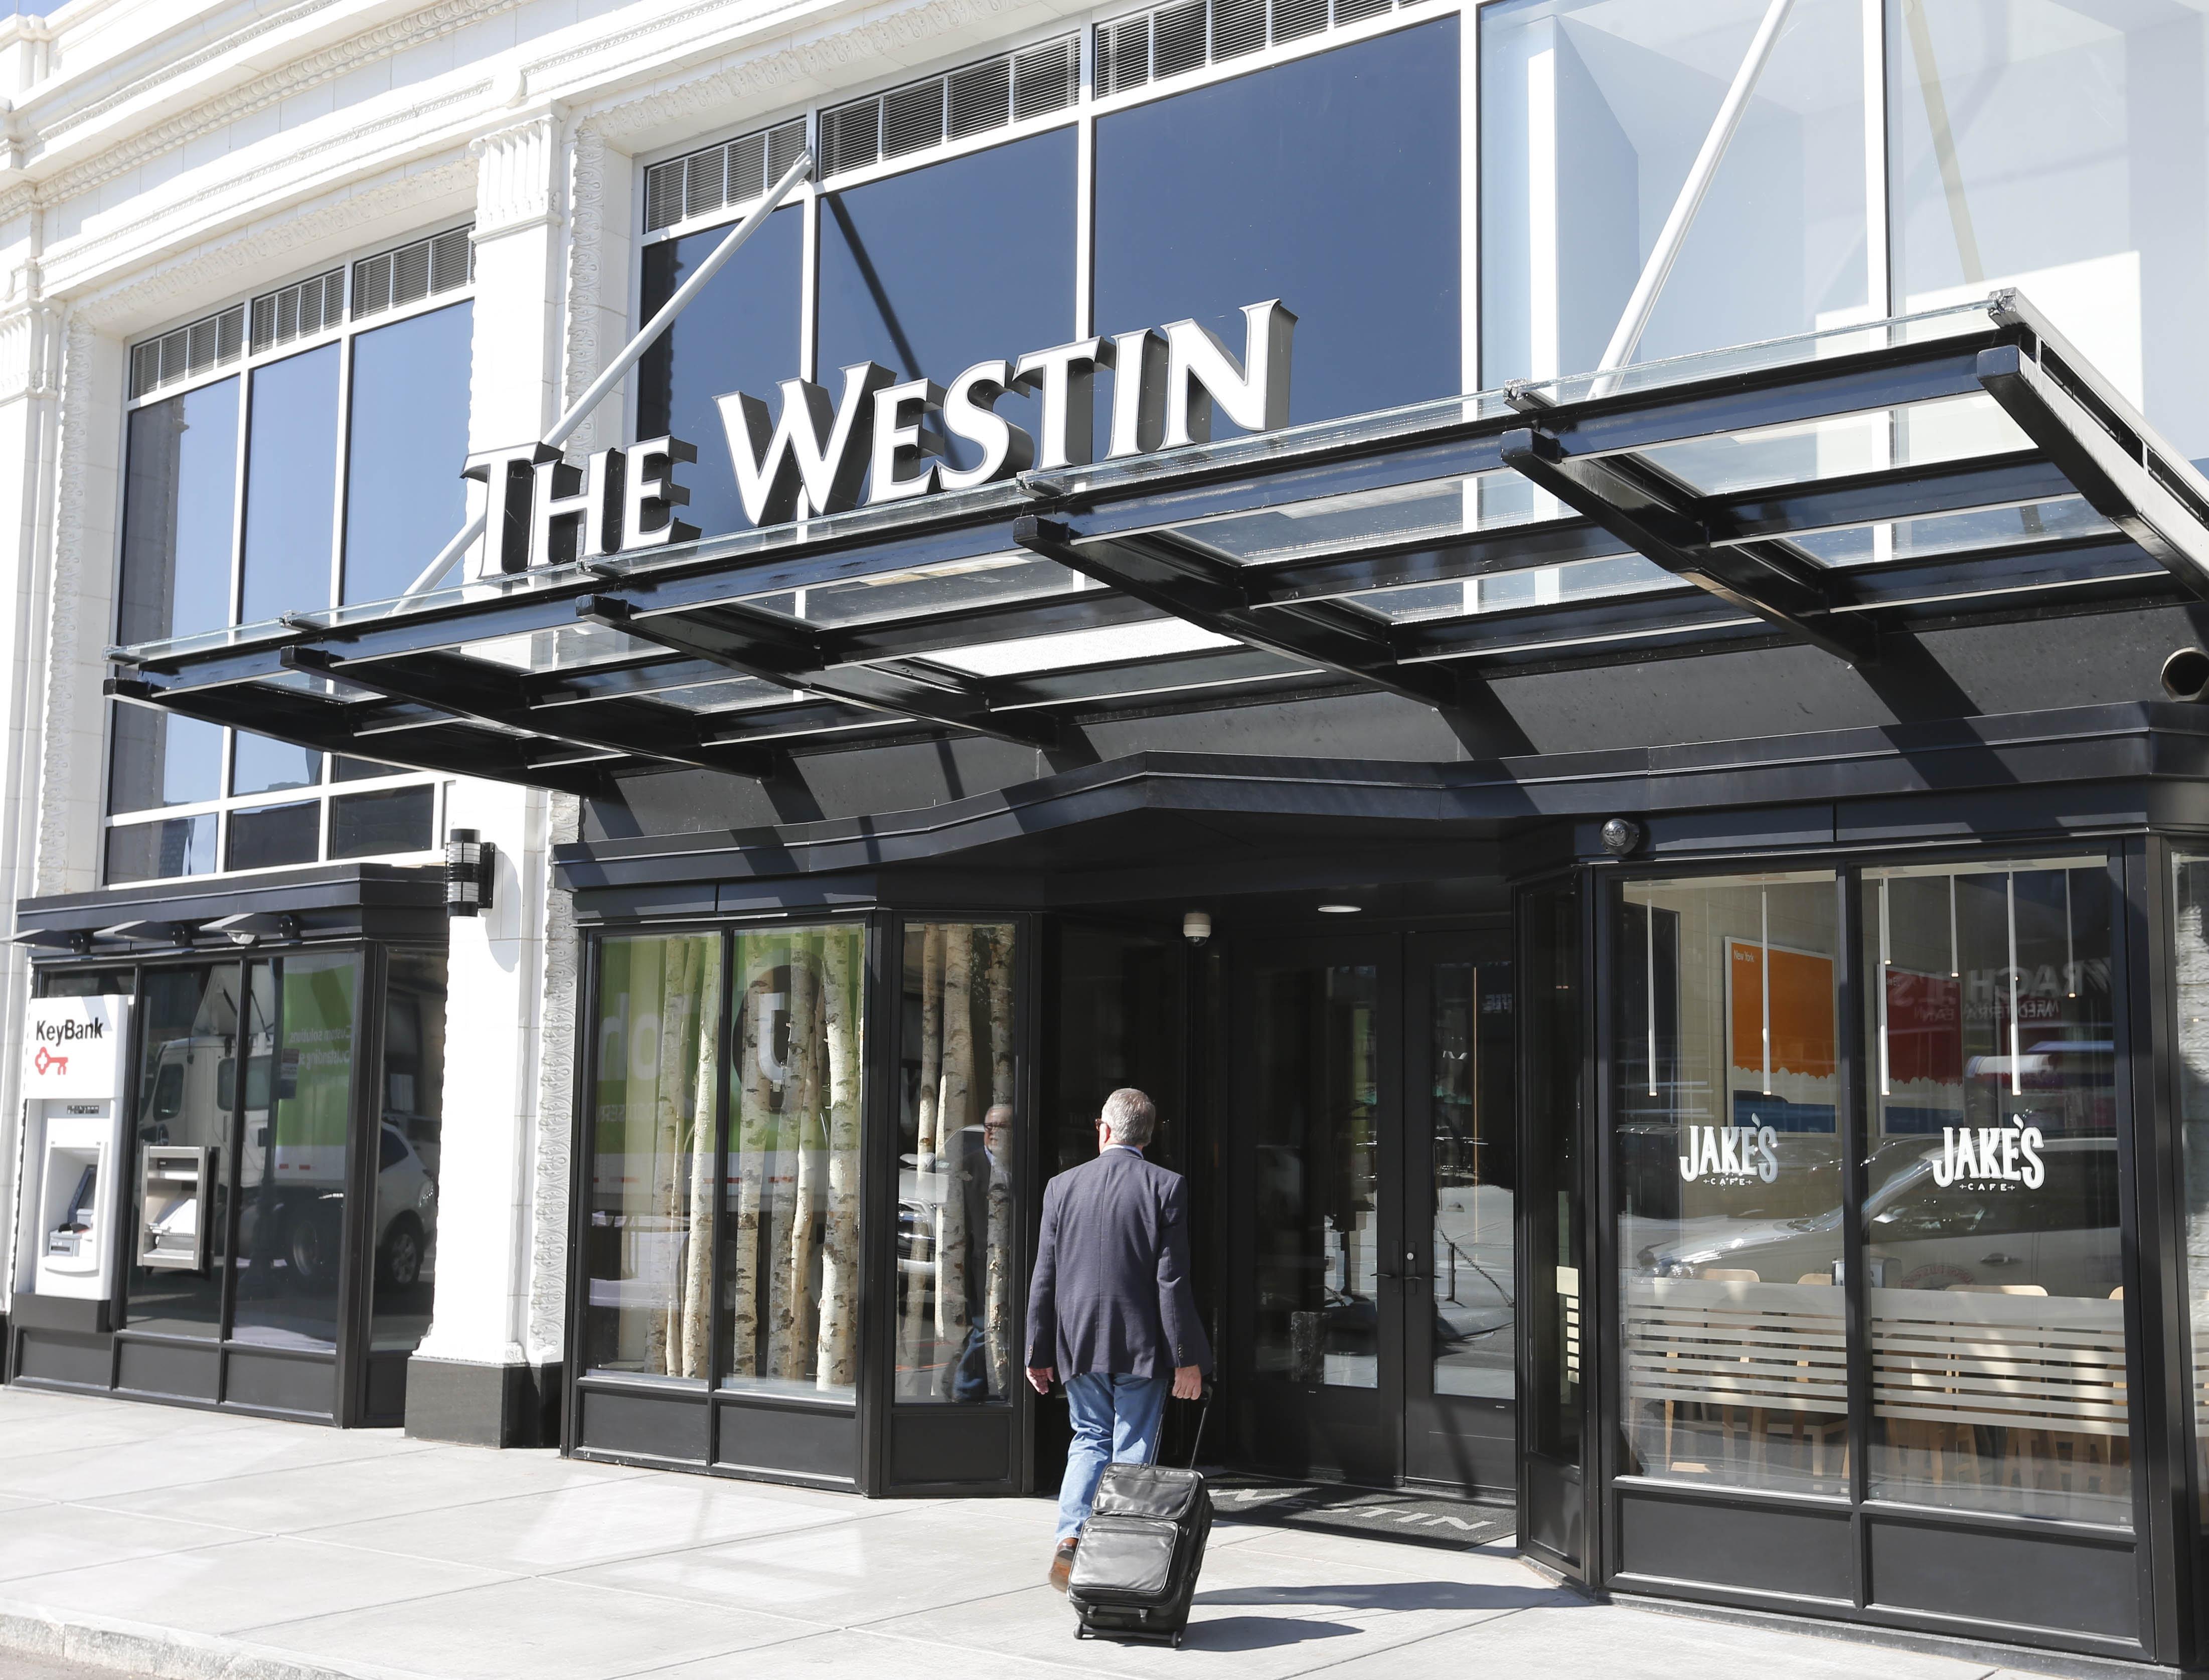 The Westin at 250 Delaware Avenue in downtown Buffalo. (Derek Gee/Buffalo News)